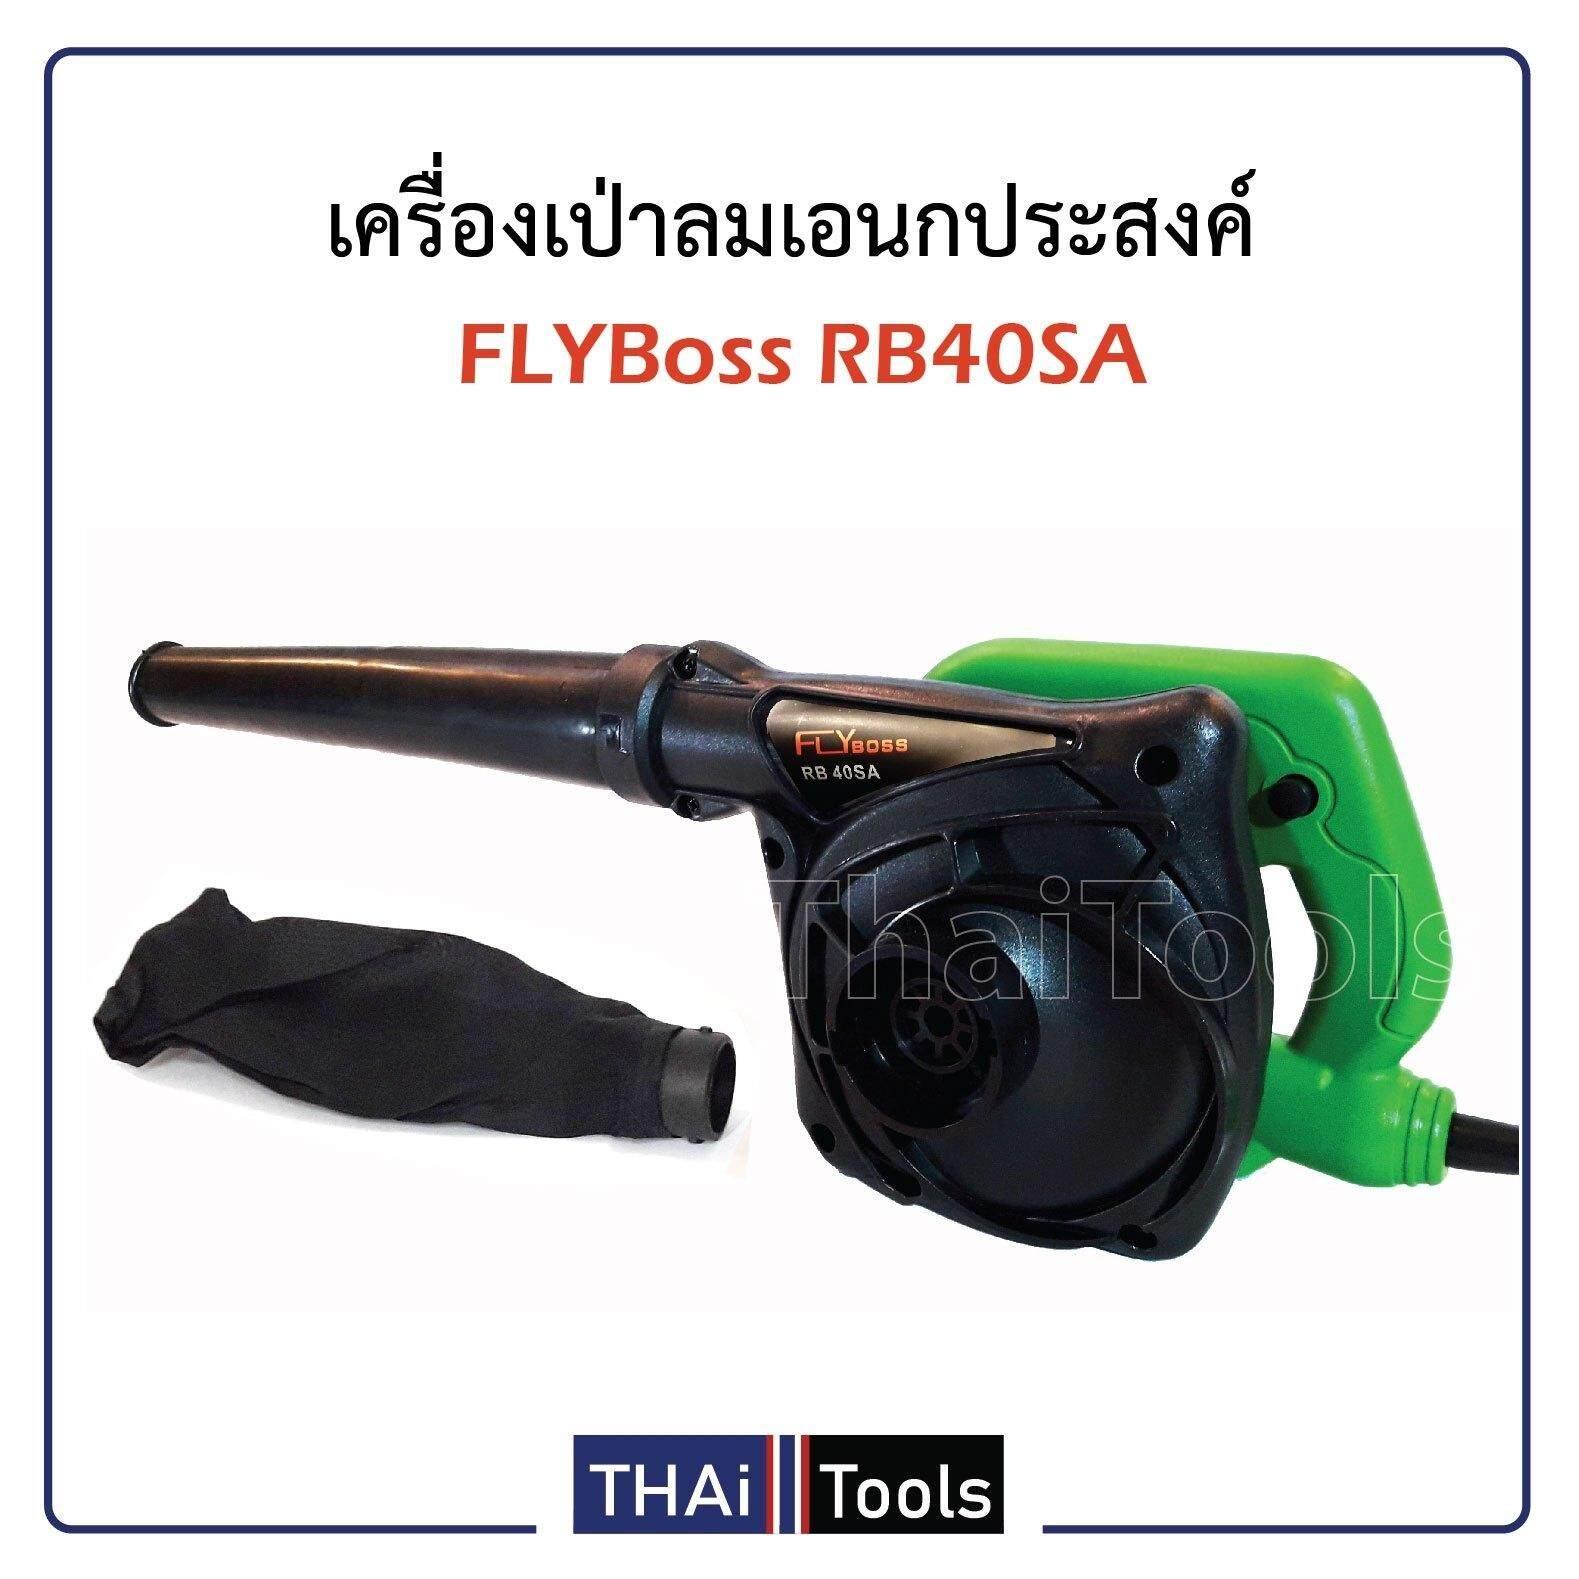 Flyboss เครื่องเป่าลม Blower รุ่น Rb-40sa.